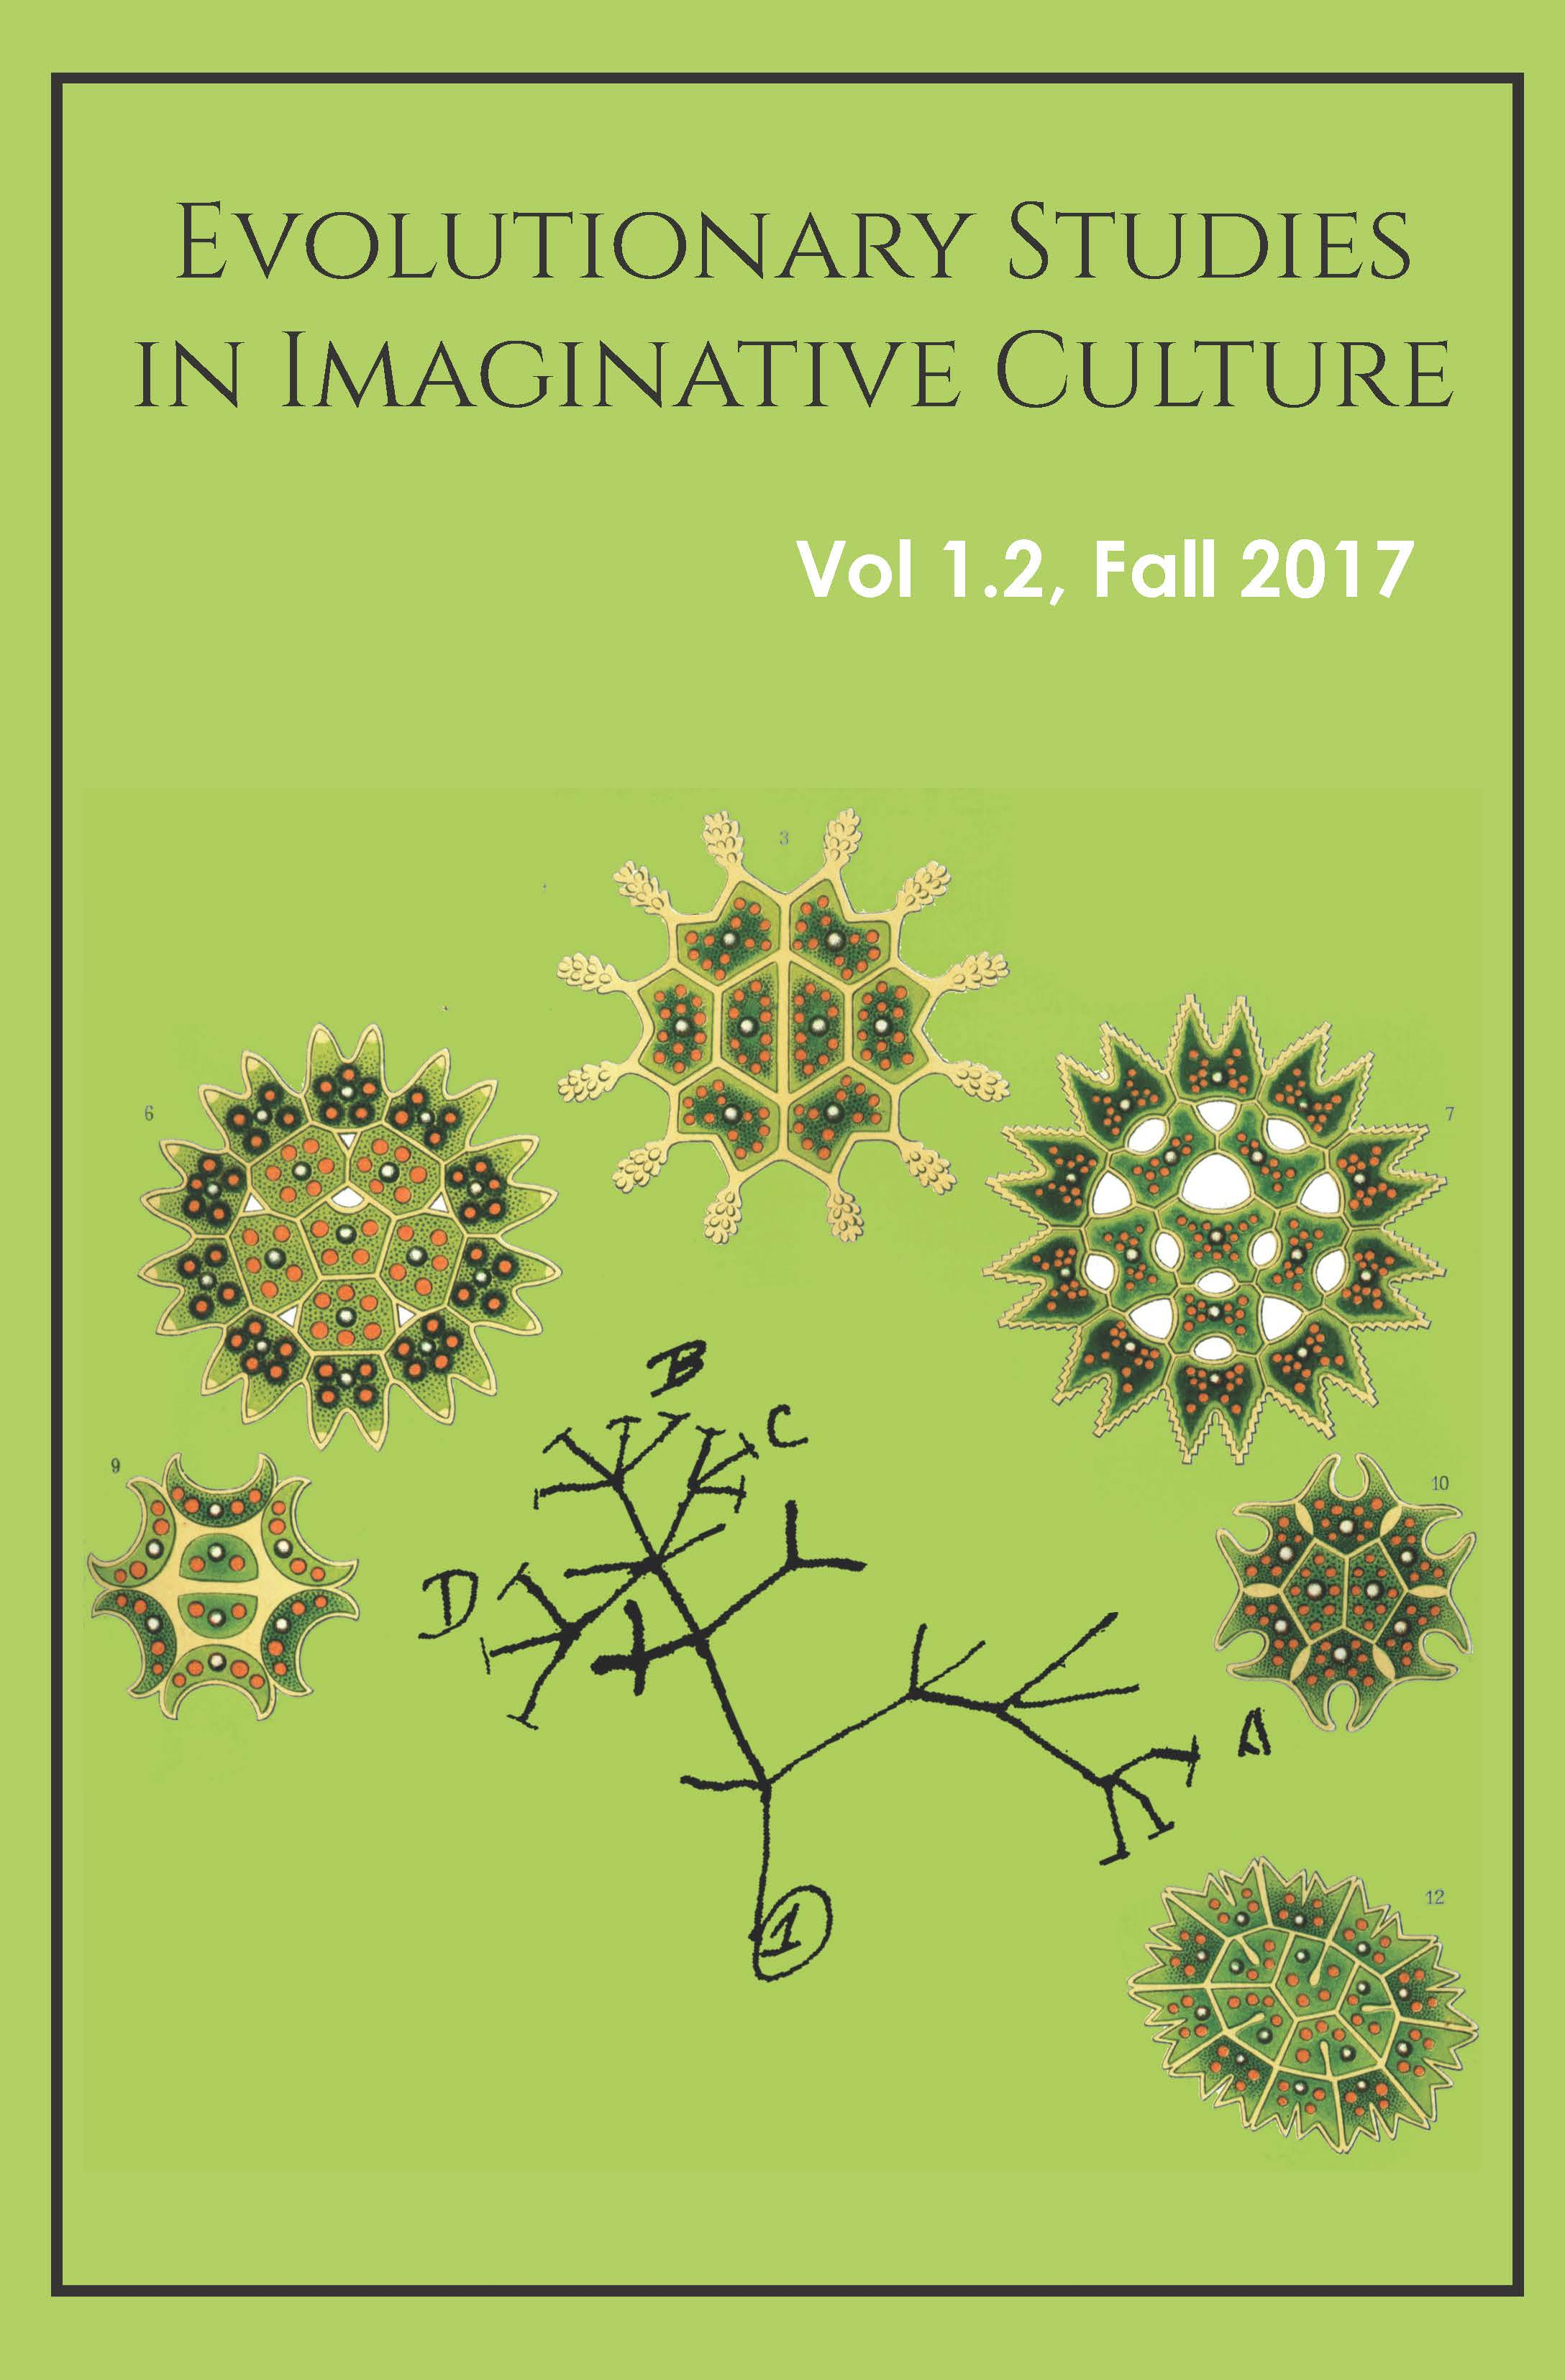 ESIC Cover 2.jpg